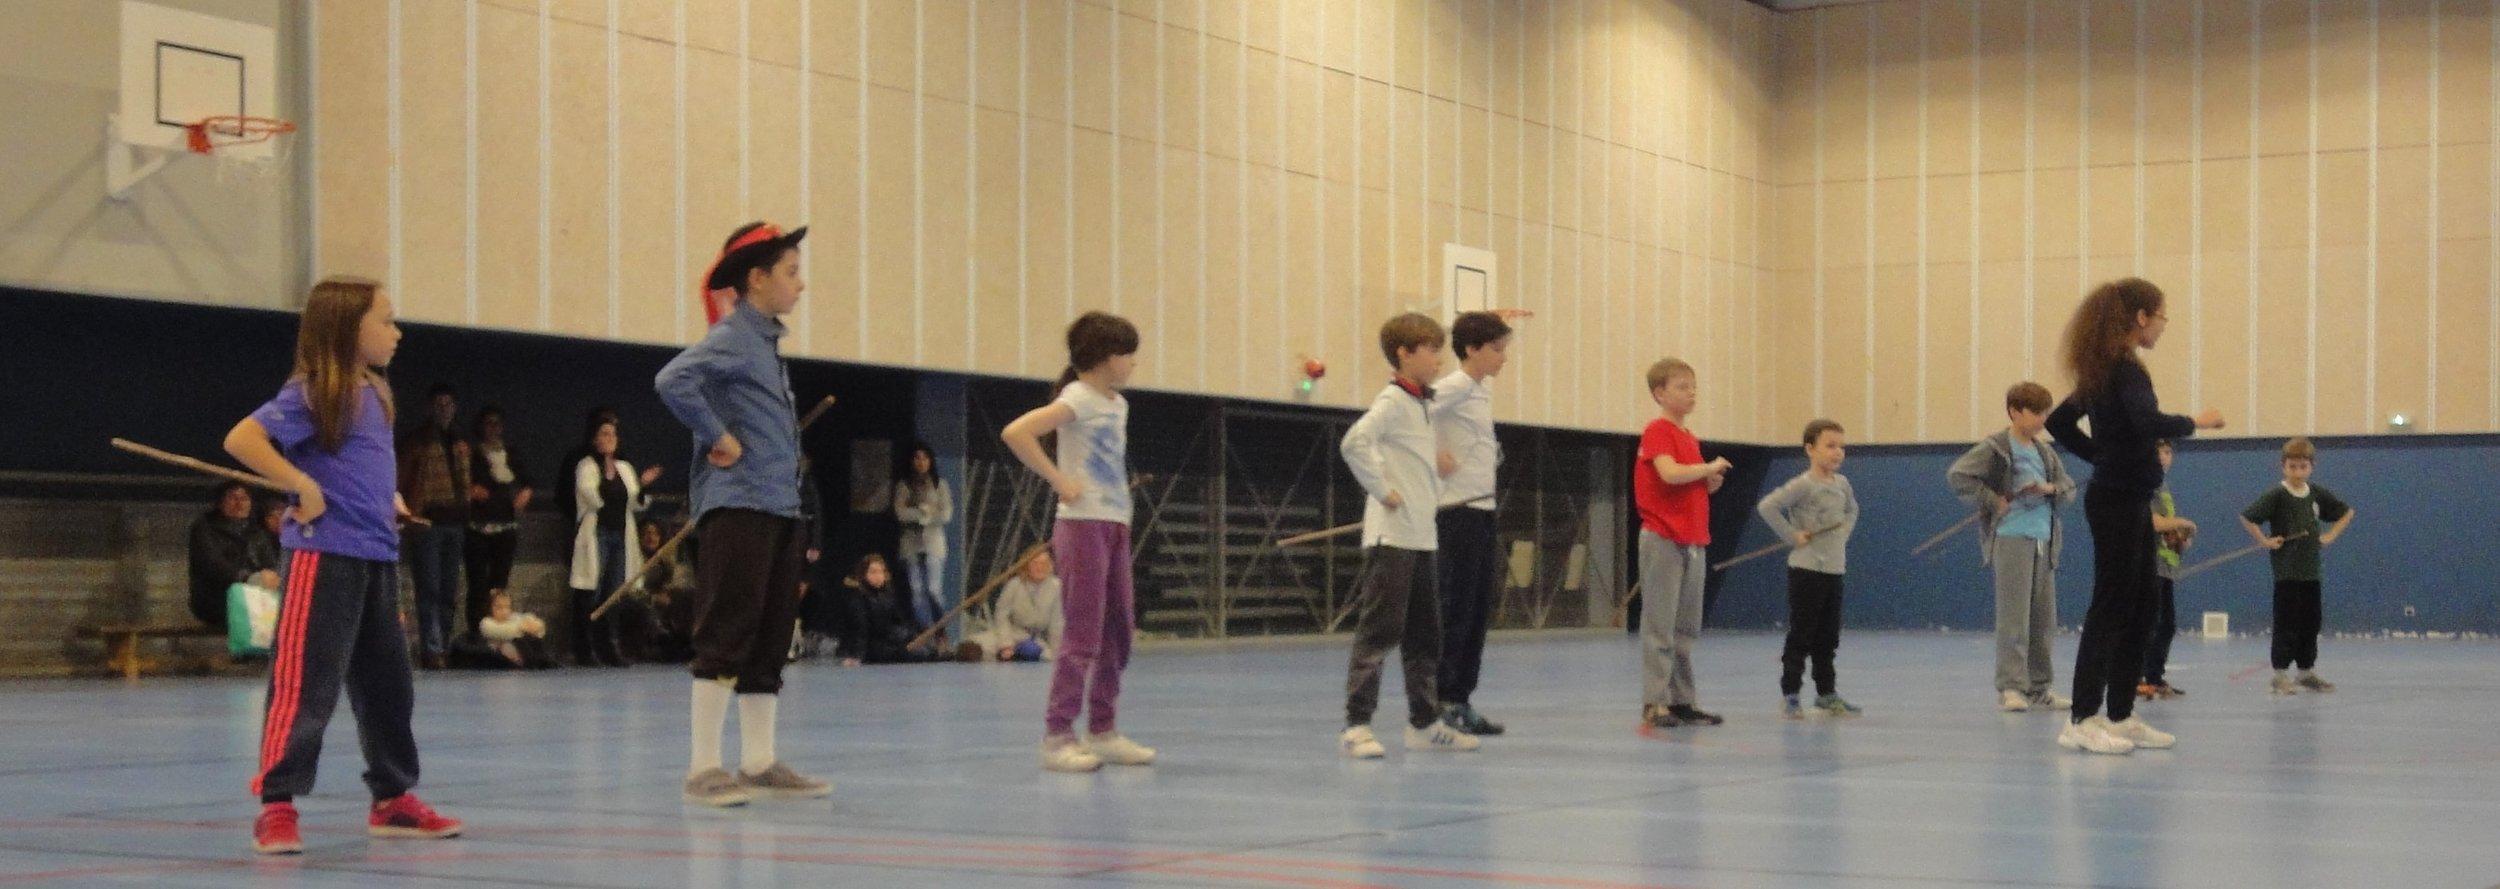 enfants - Stage à Neuilly - Février 2016